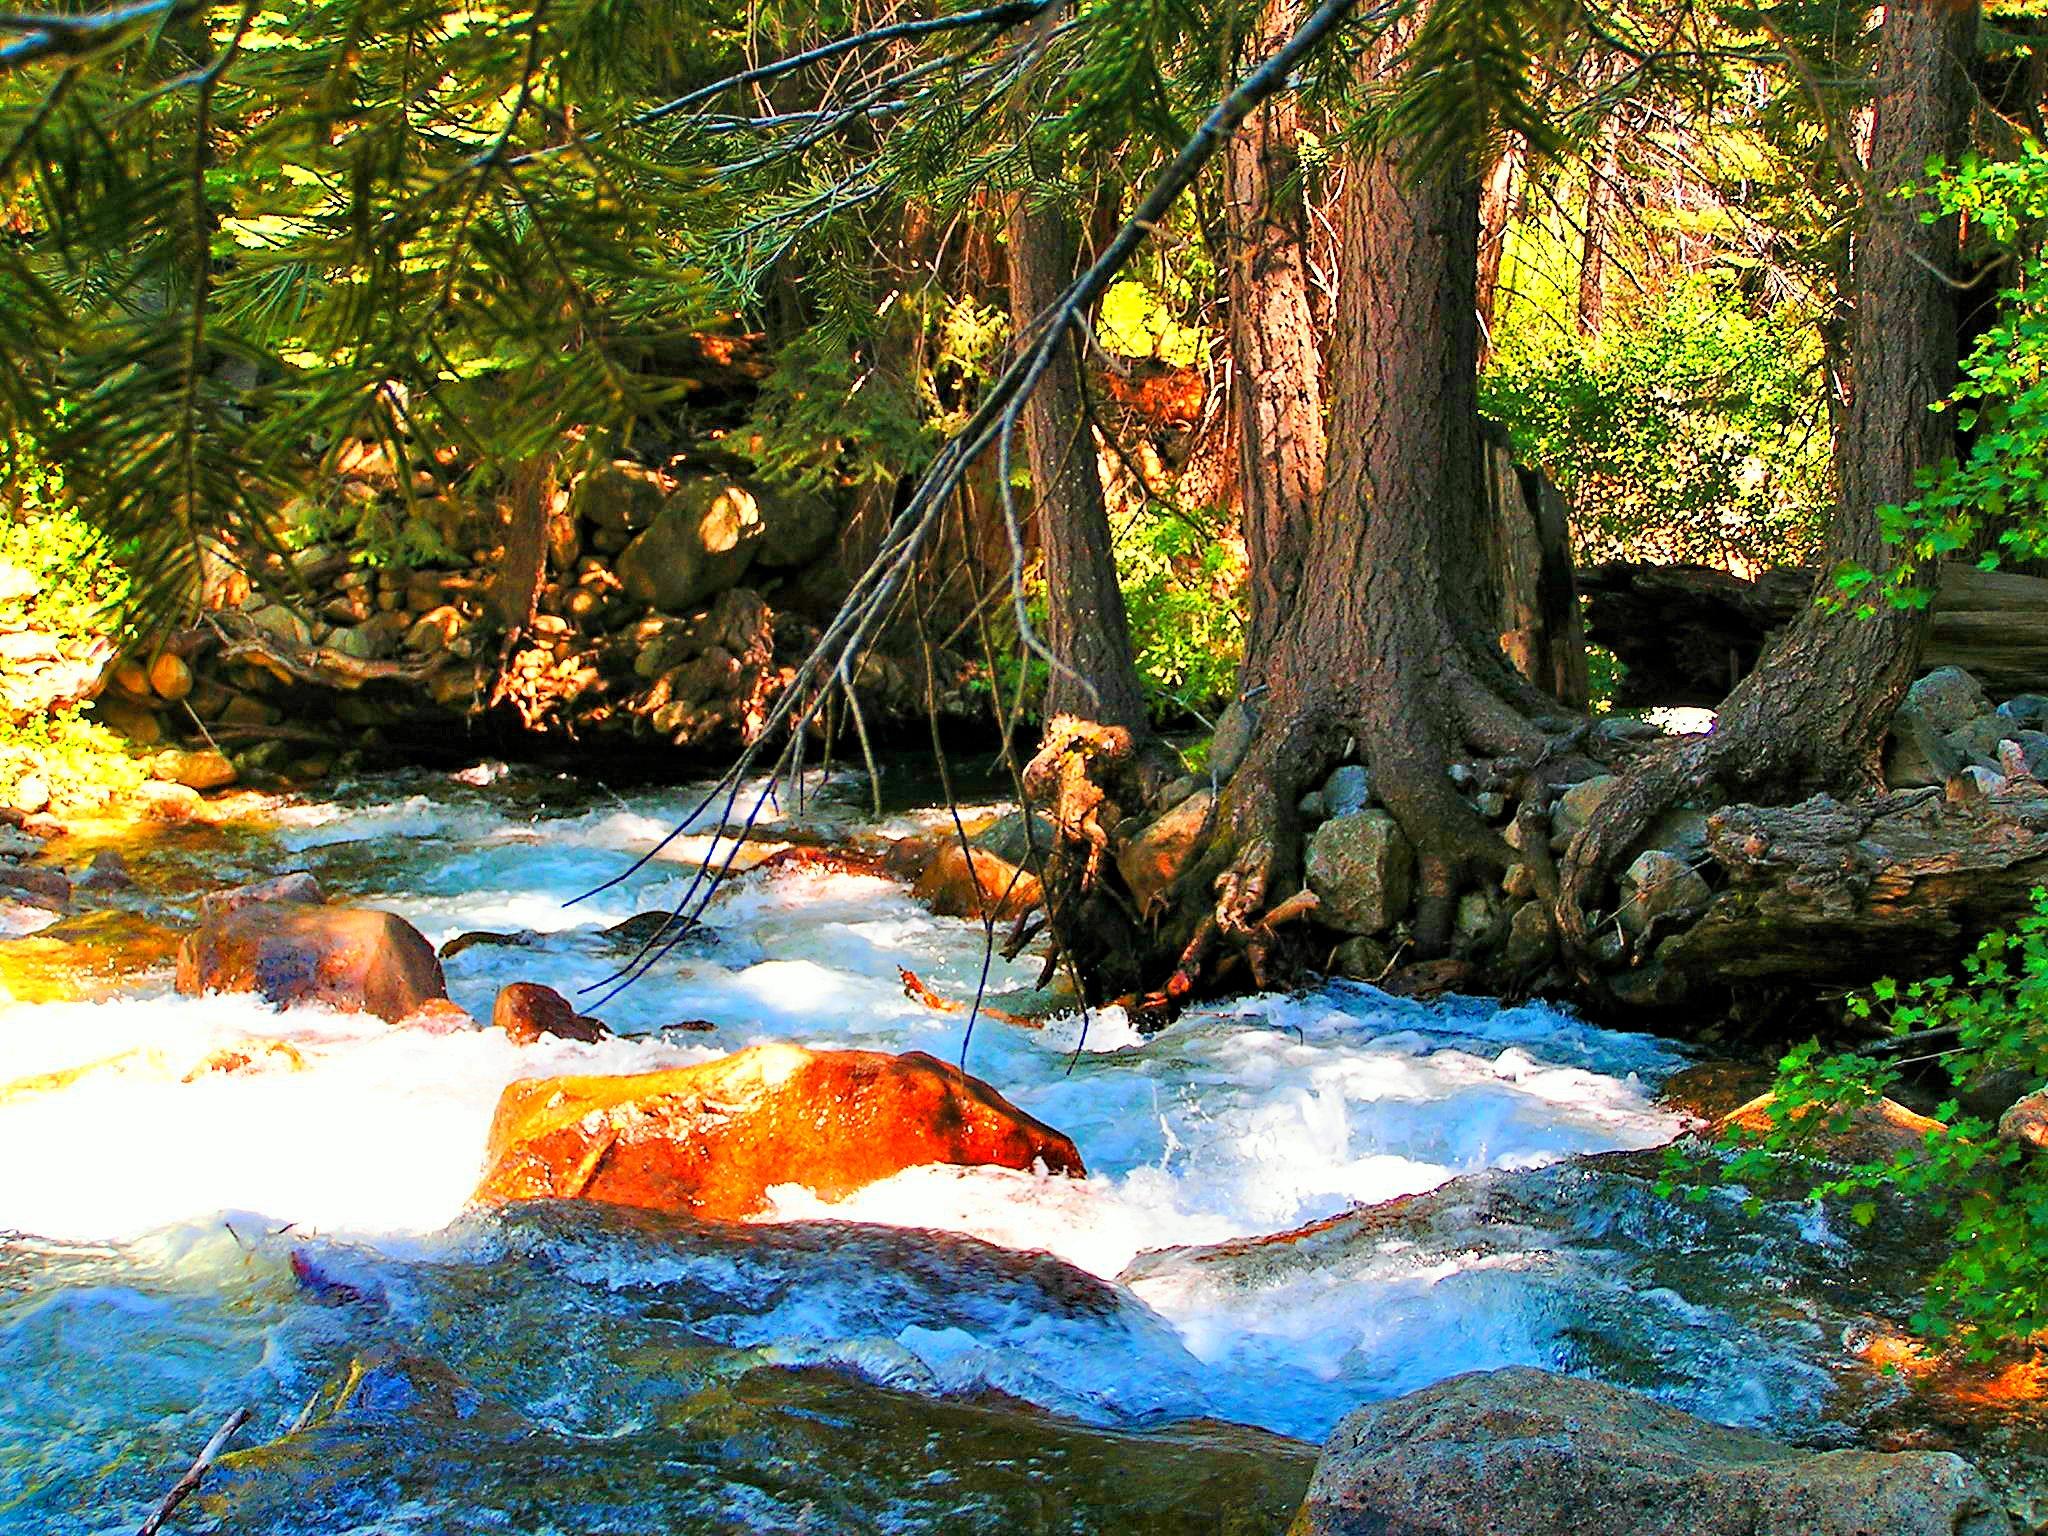 Creek in Desolation Wilderness by rayboudewyn